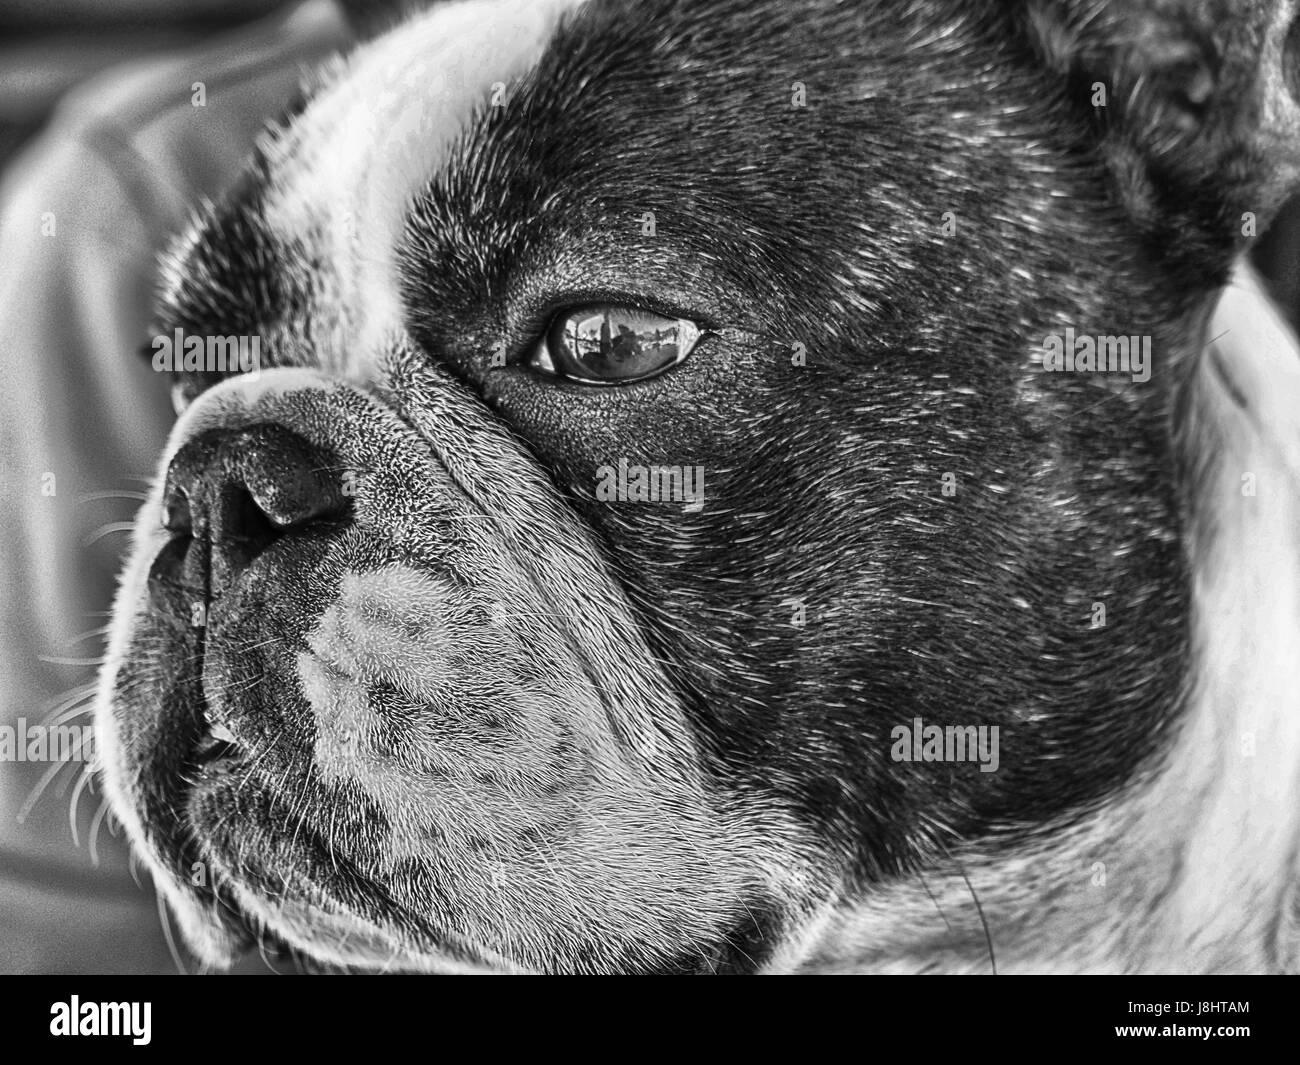 French bulldog - Stock Image